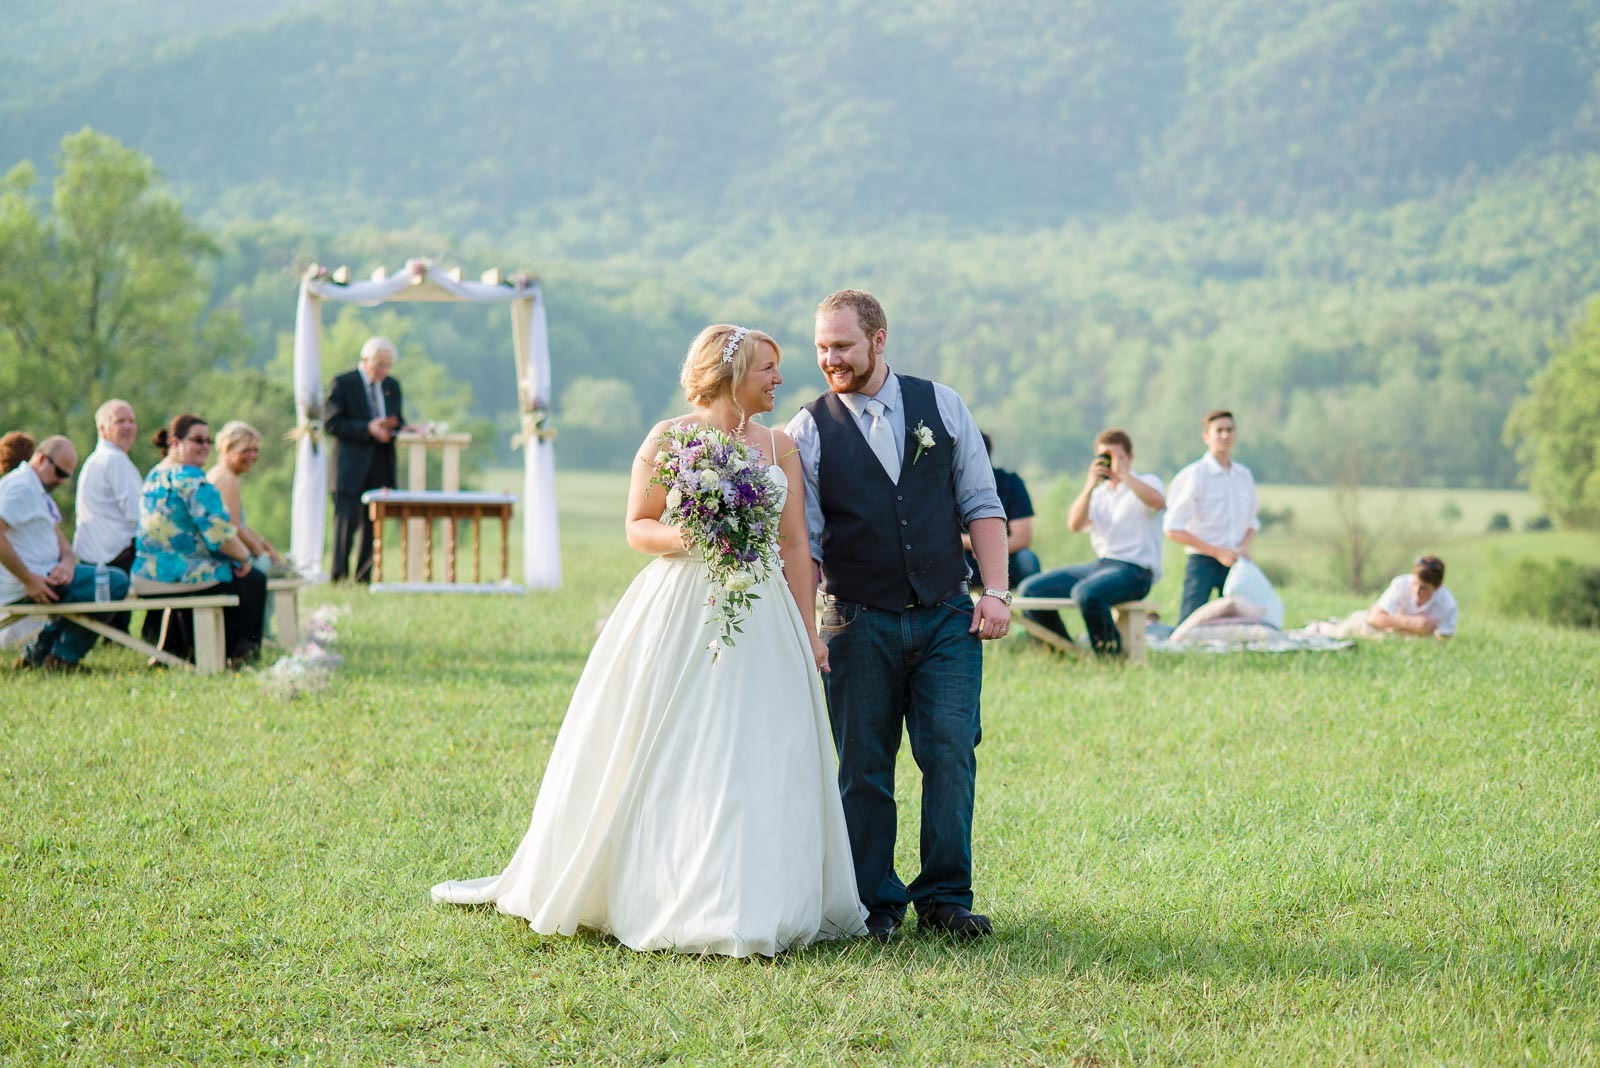 Cades Cove Weddingsmoky Mountain Wedding Venue Intimate Tennessee